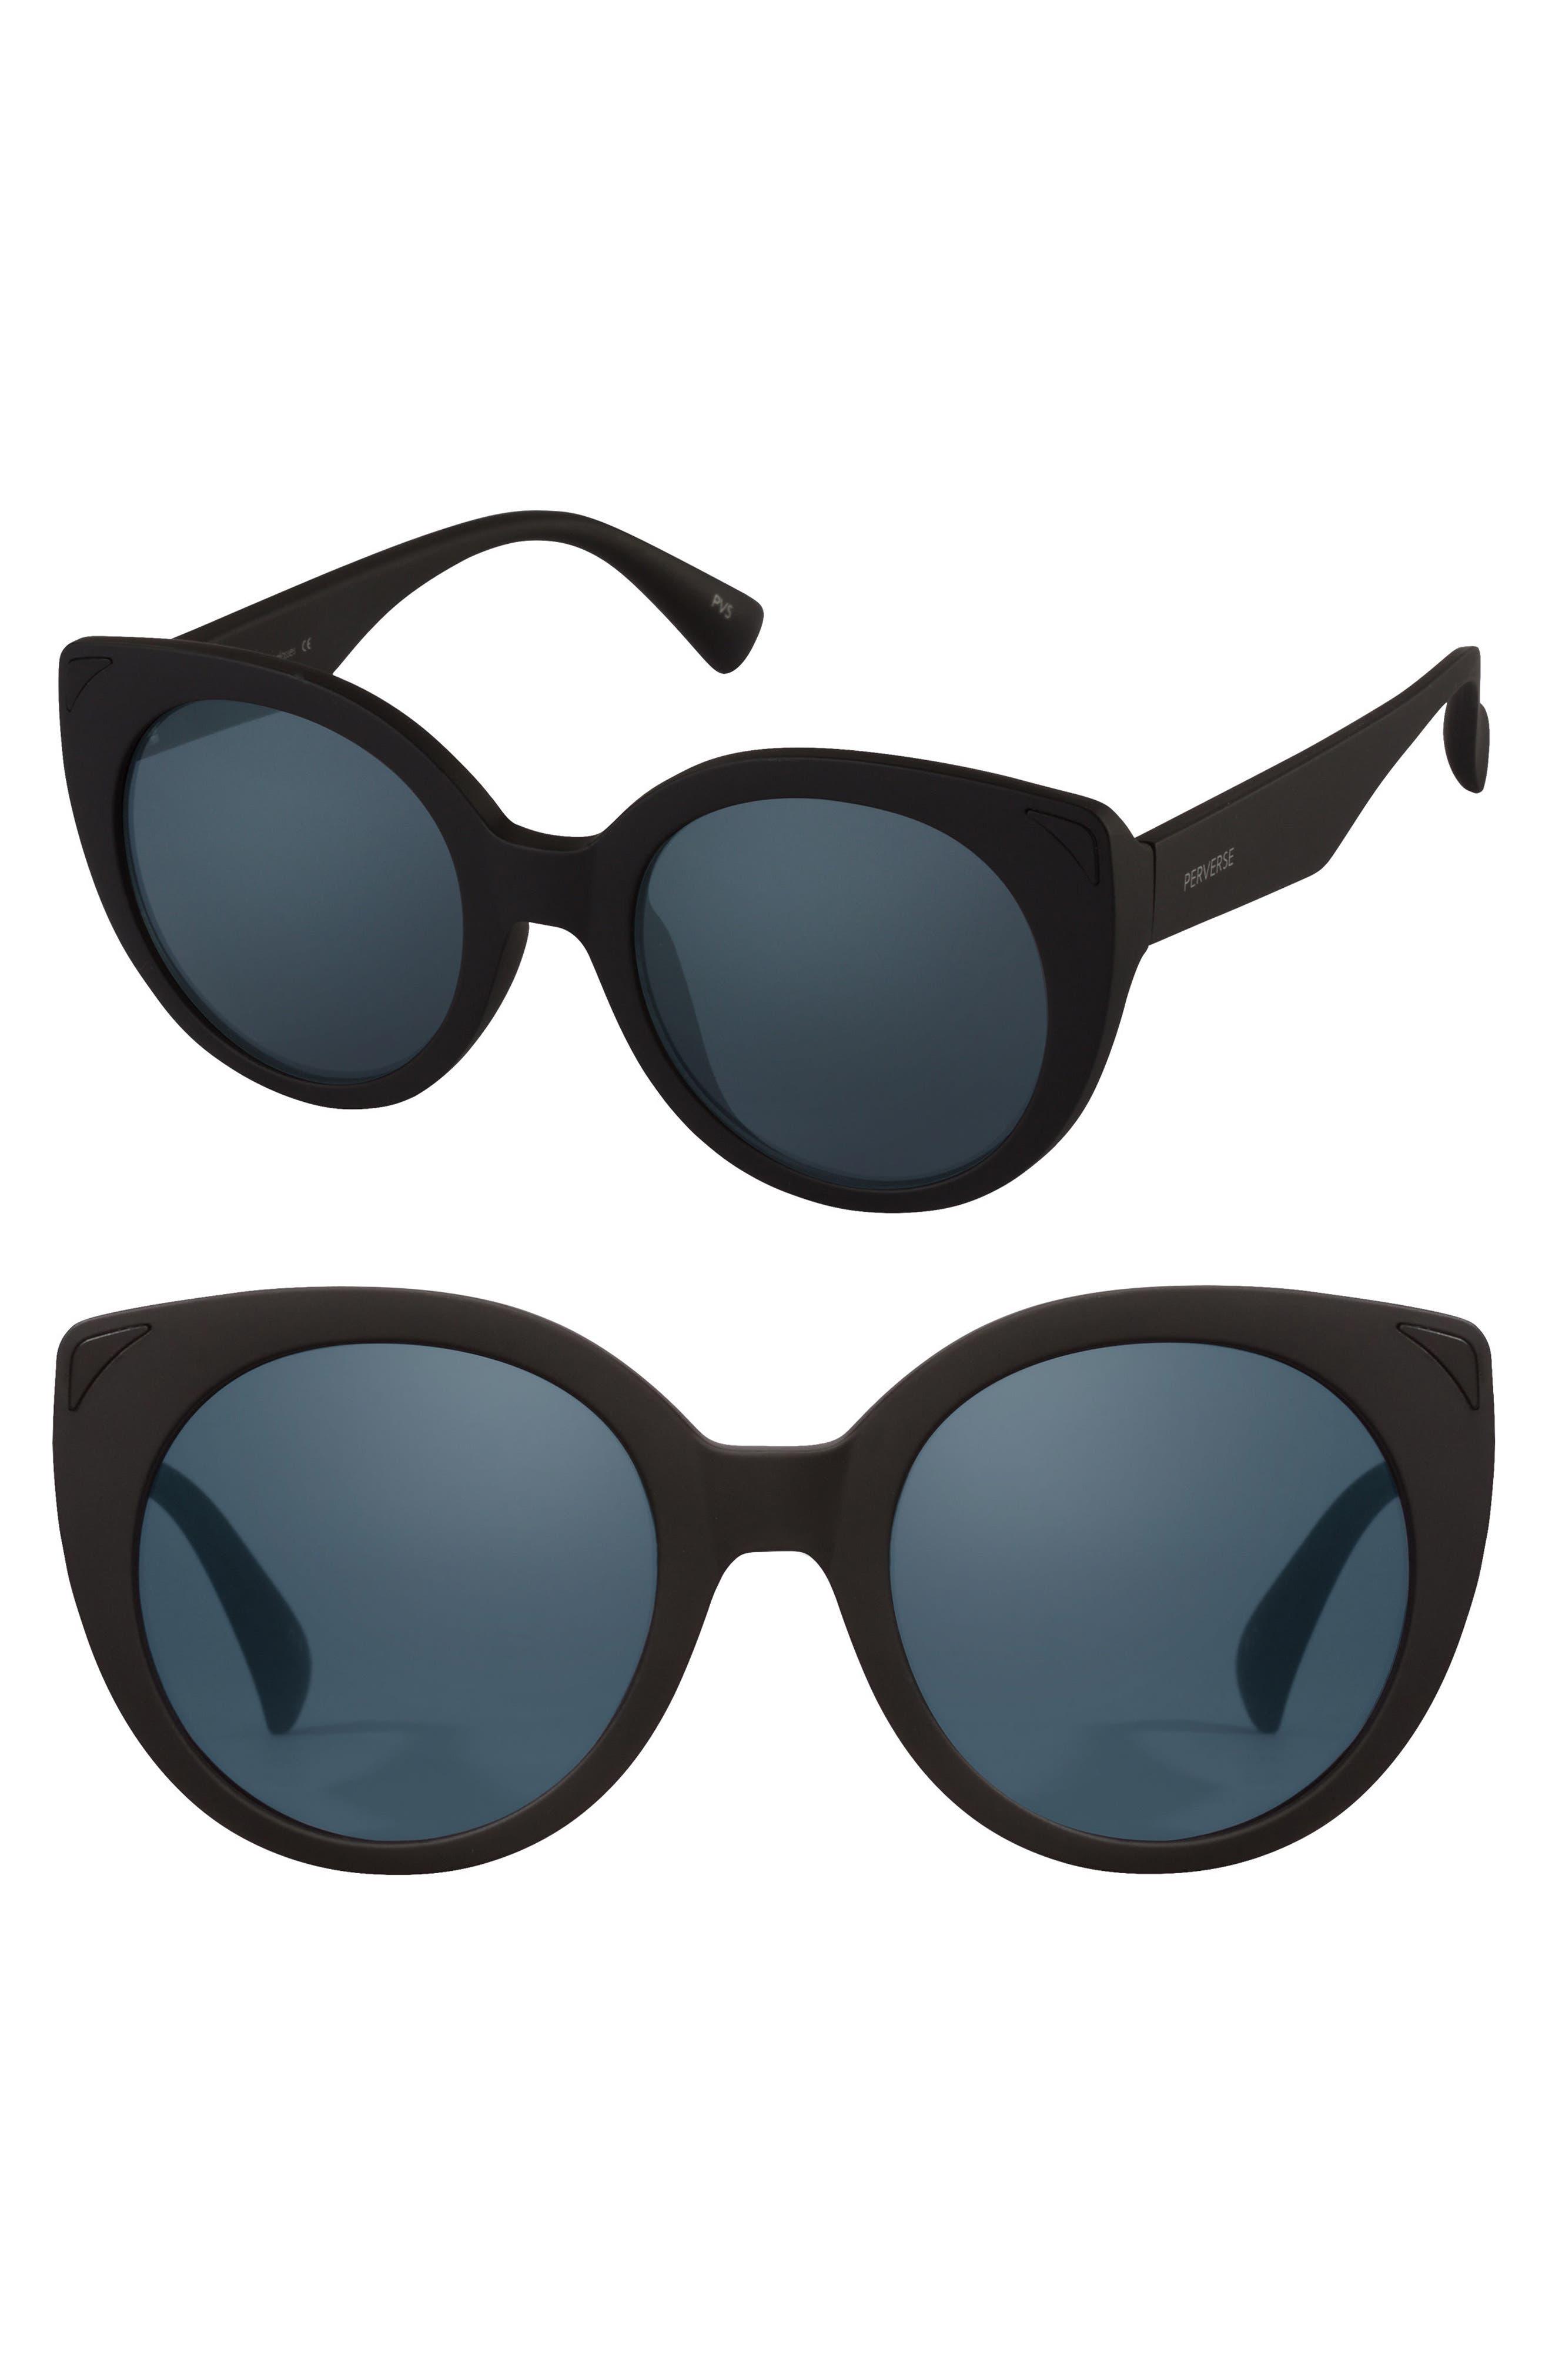 49mm Feline Round Cat Eye Sunglasses,                         Main,                         color, 001